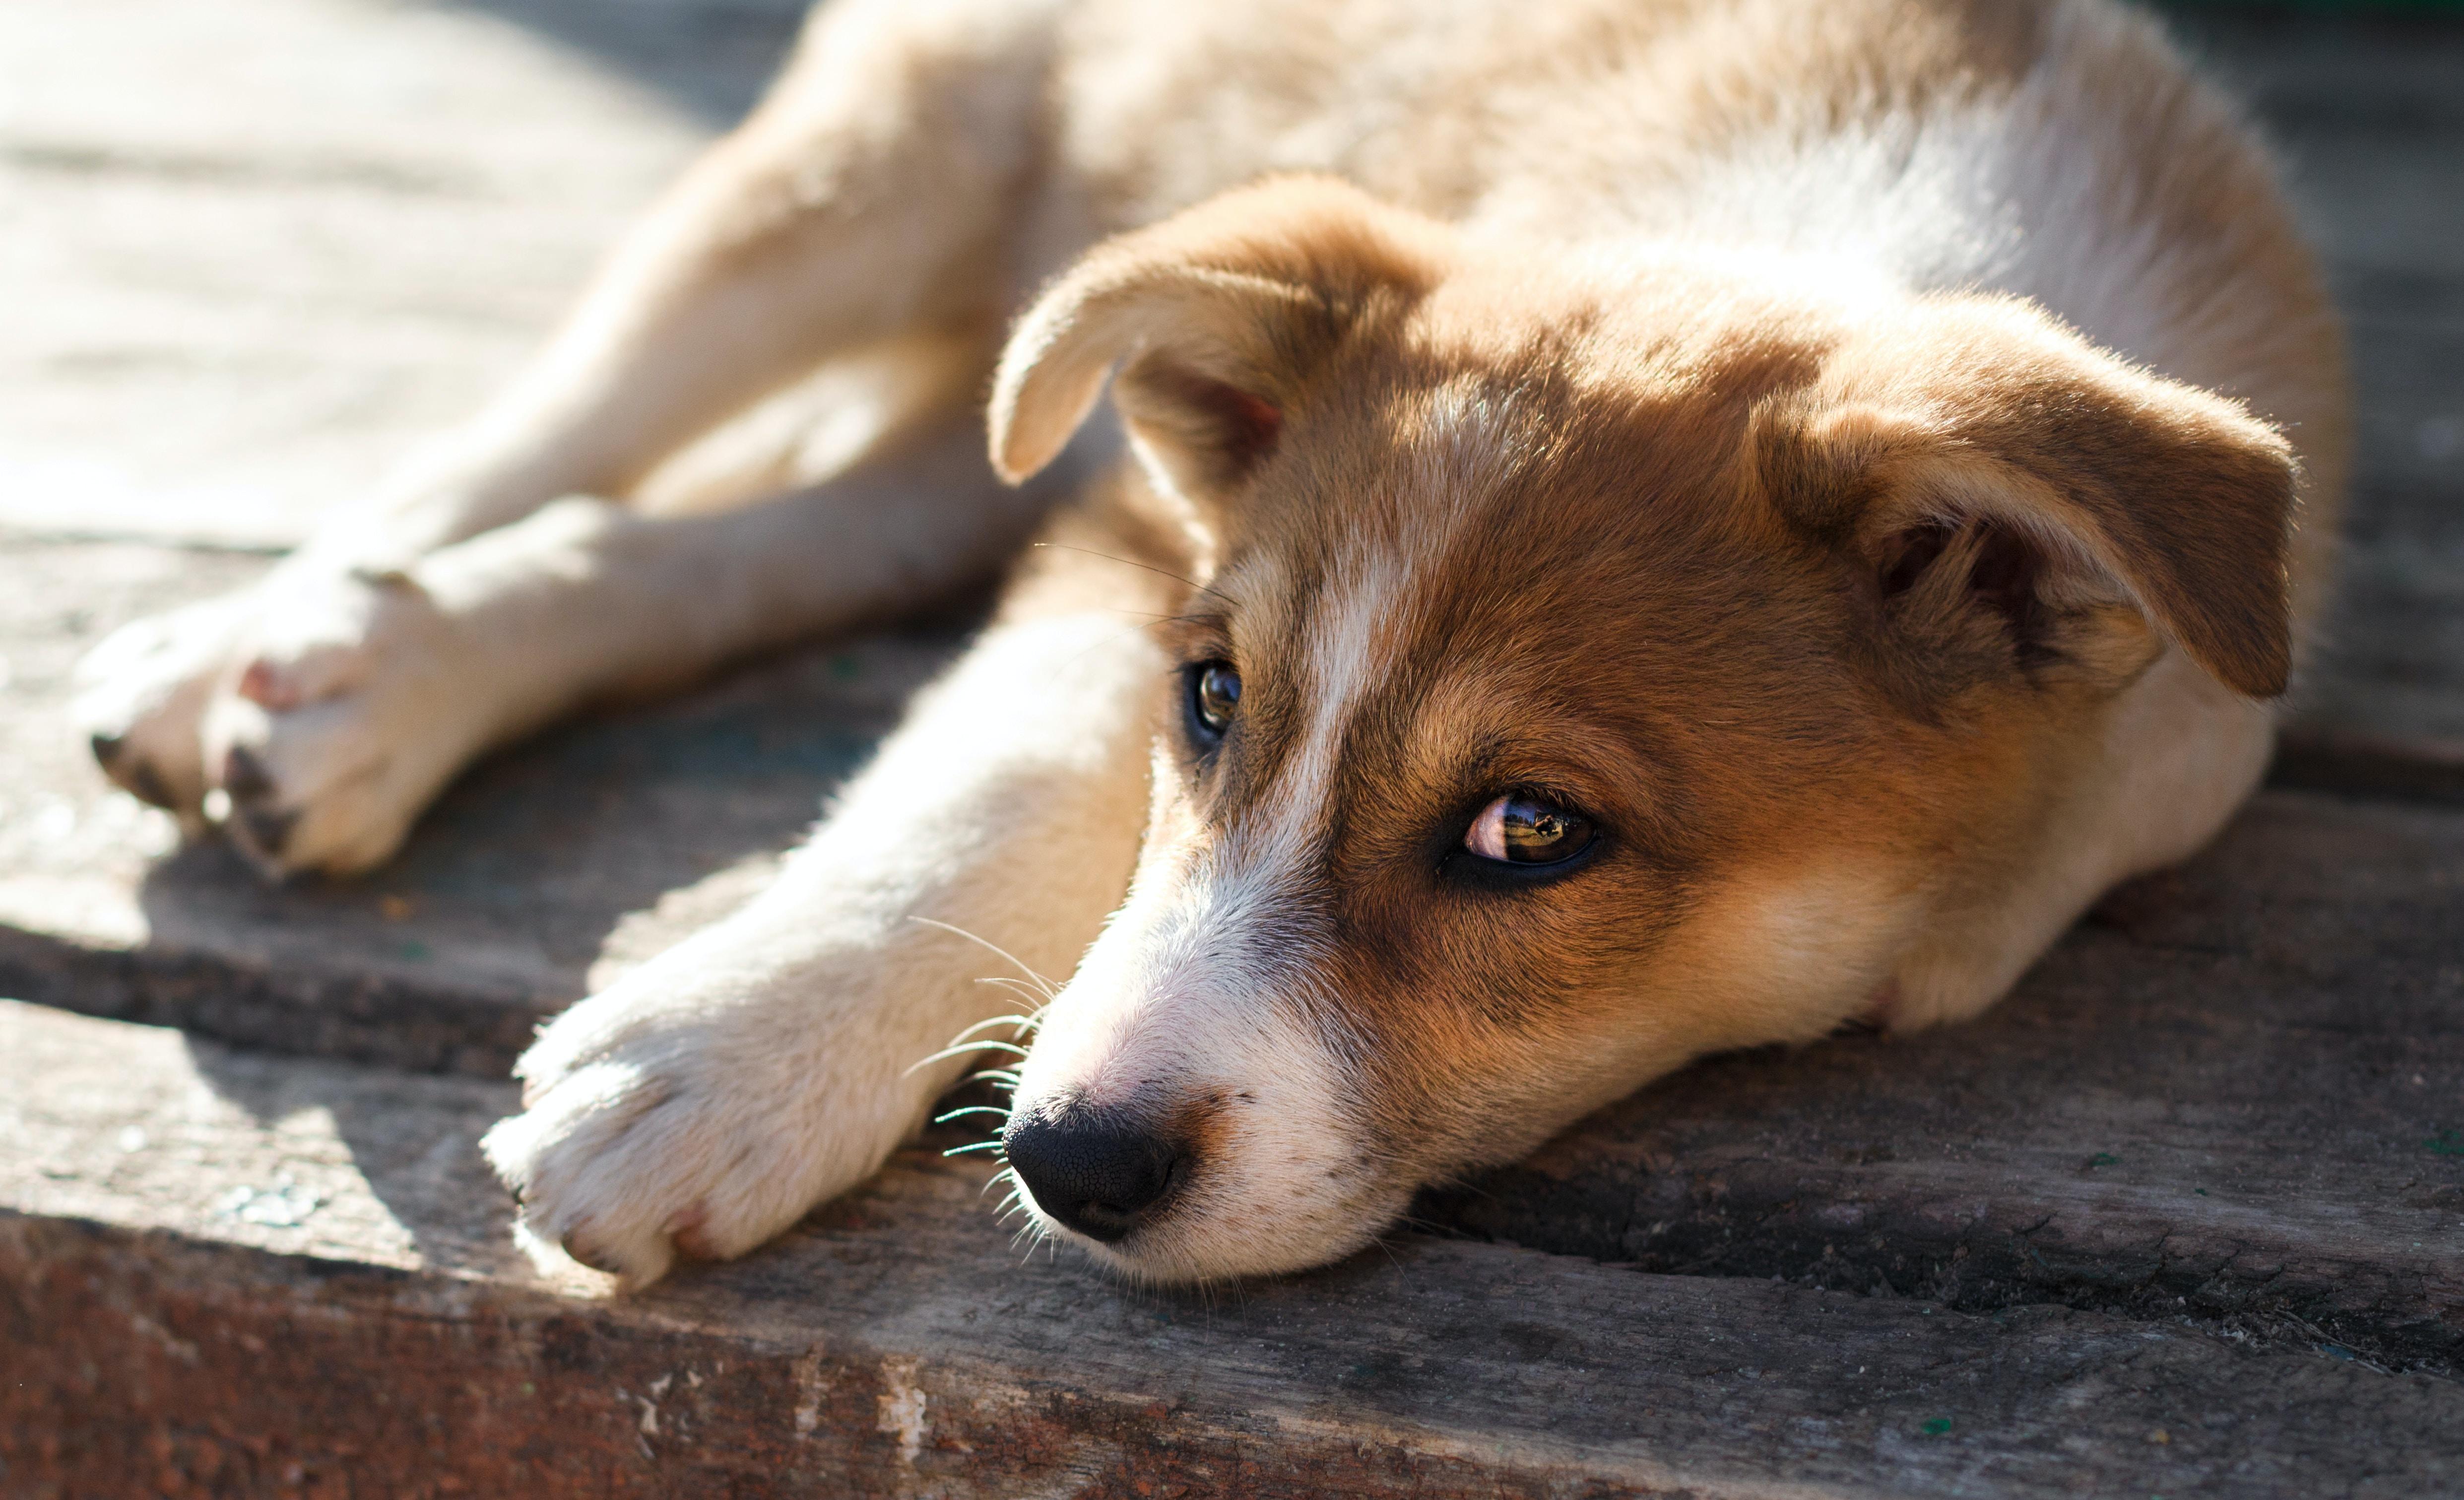 pet dog laying on brown surface